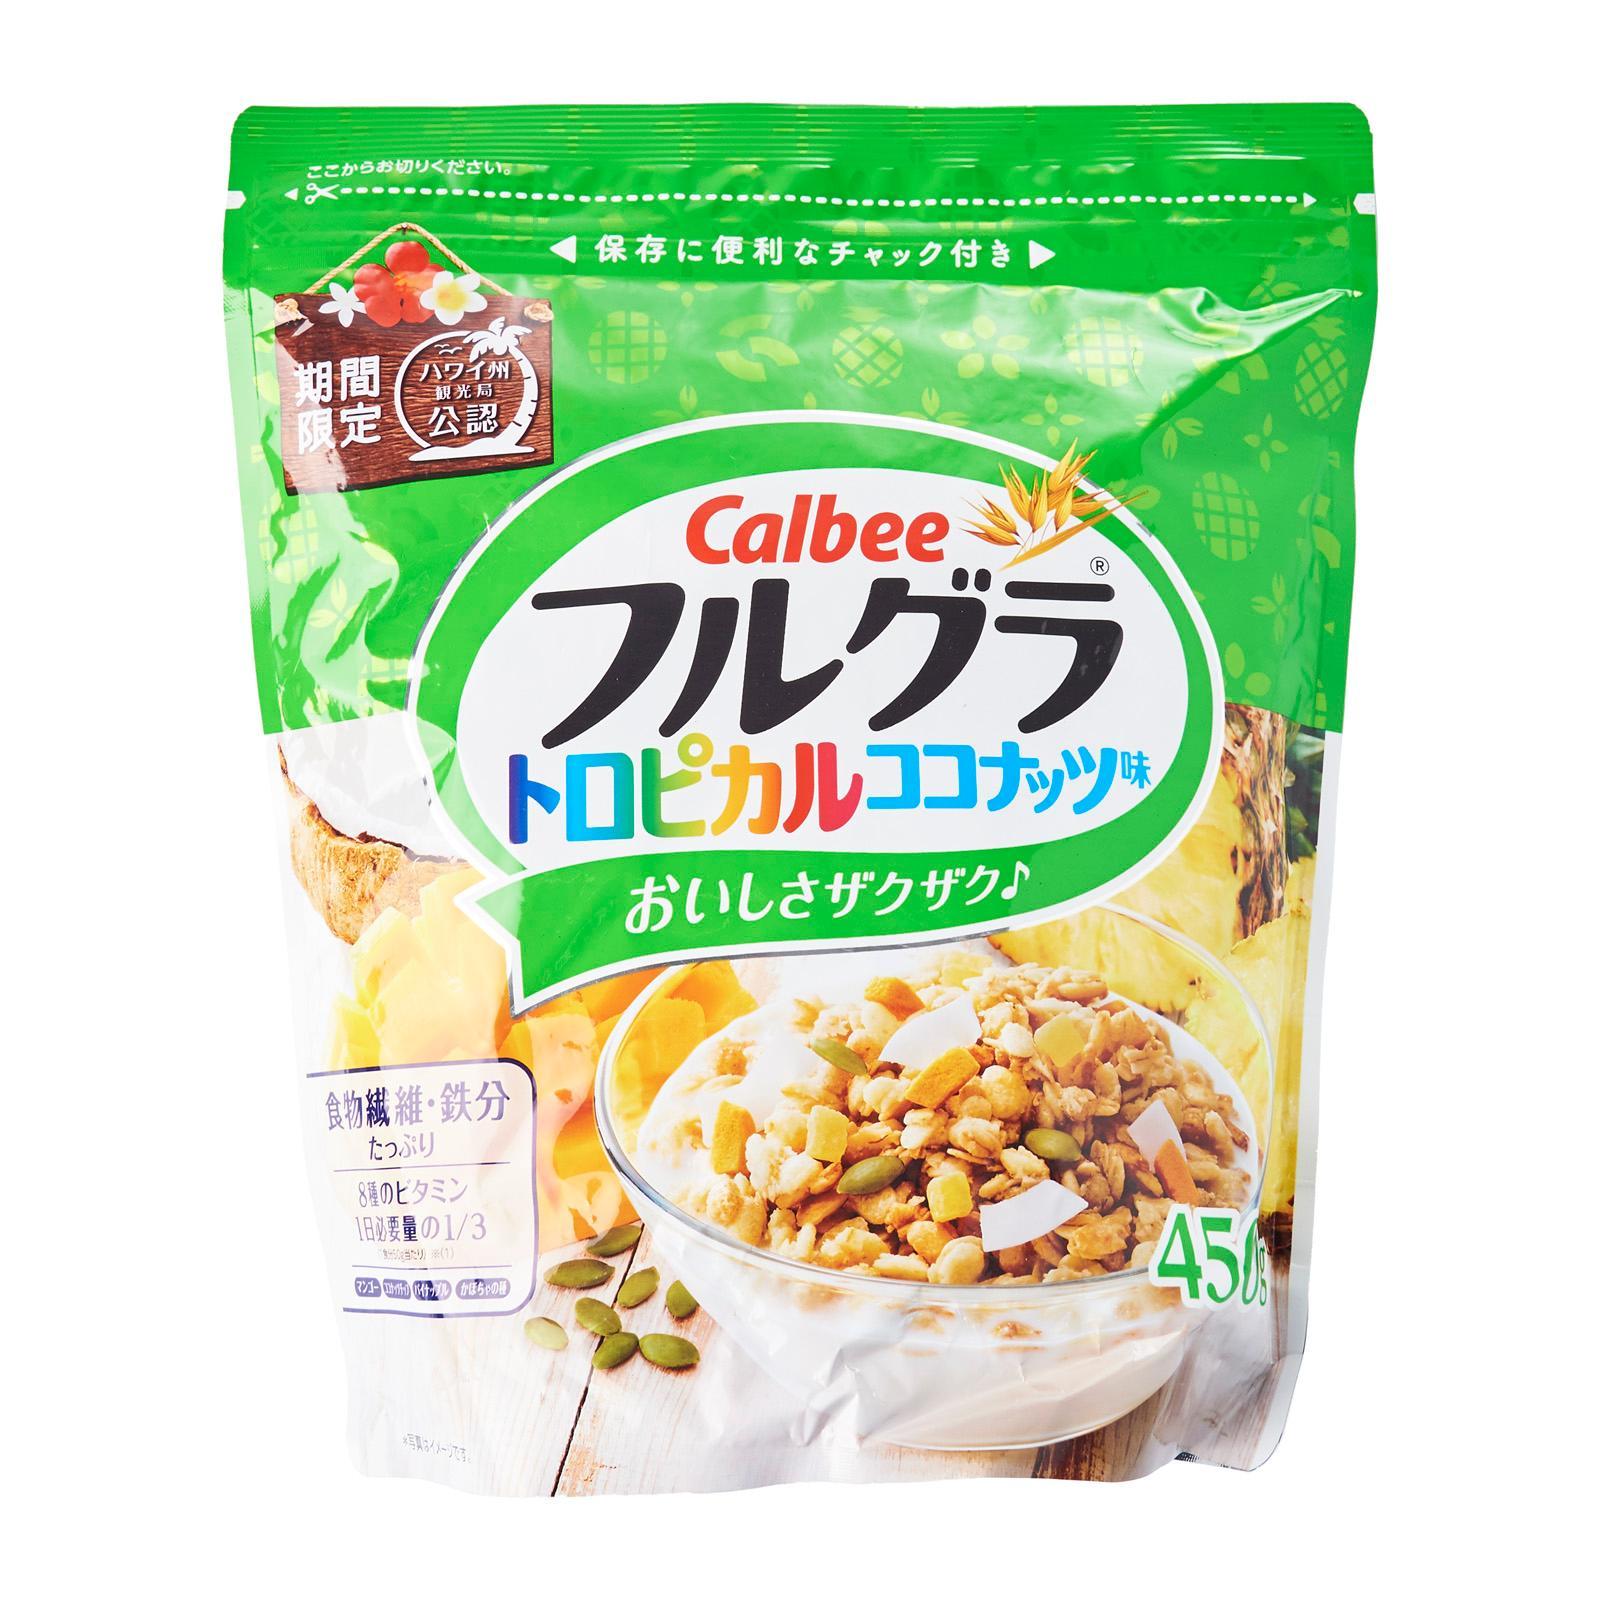 Calbee Tropical Coconut Flavour Granola